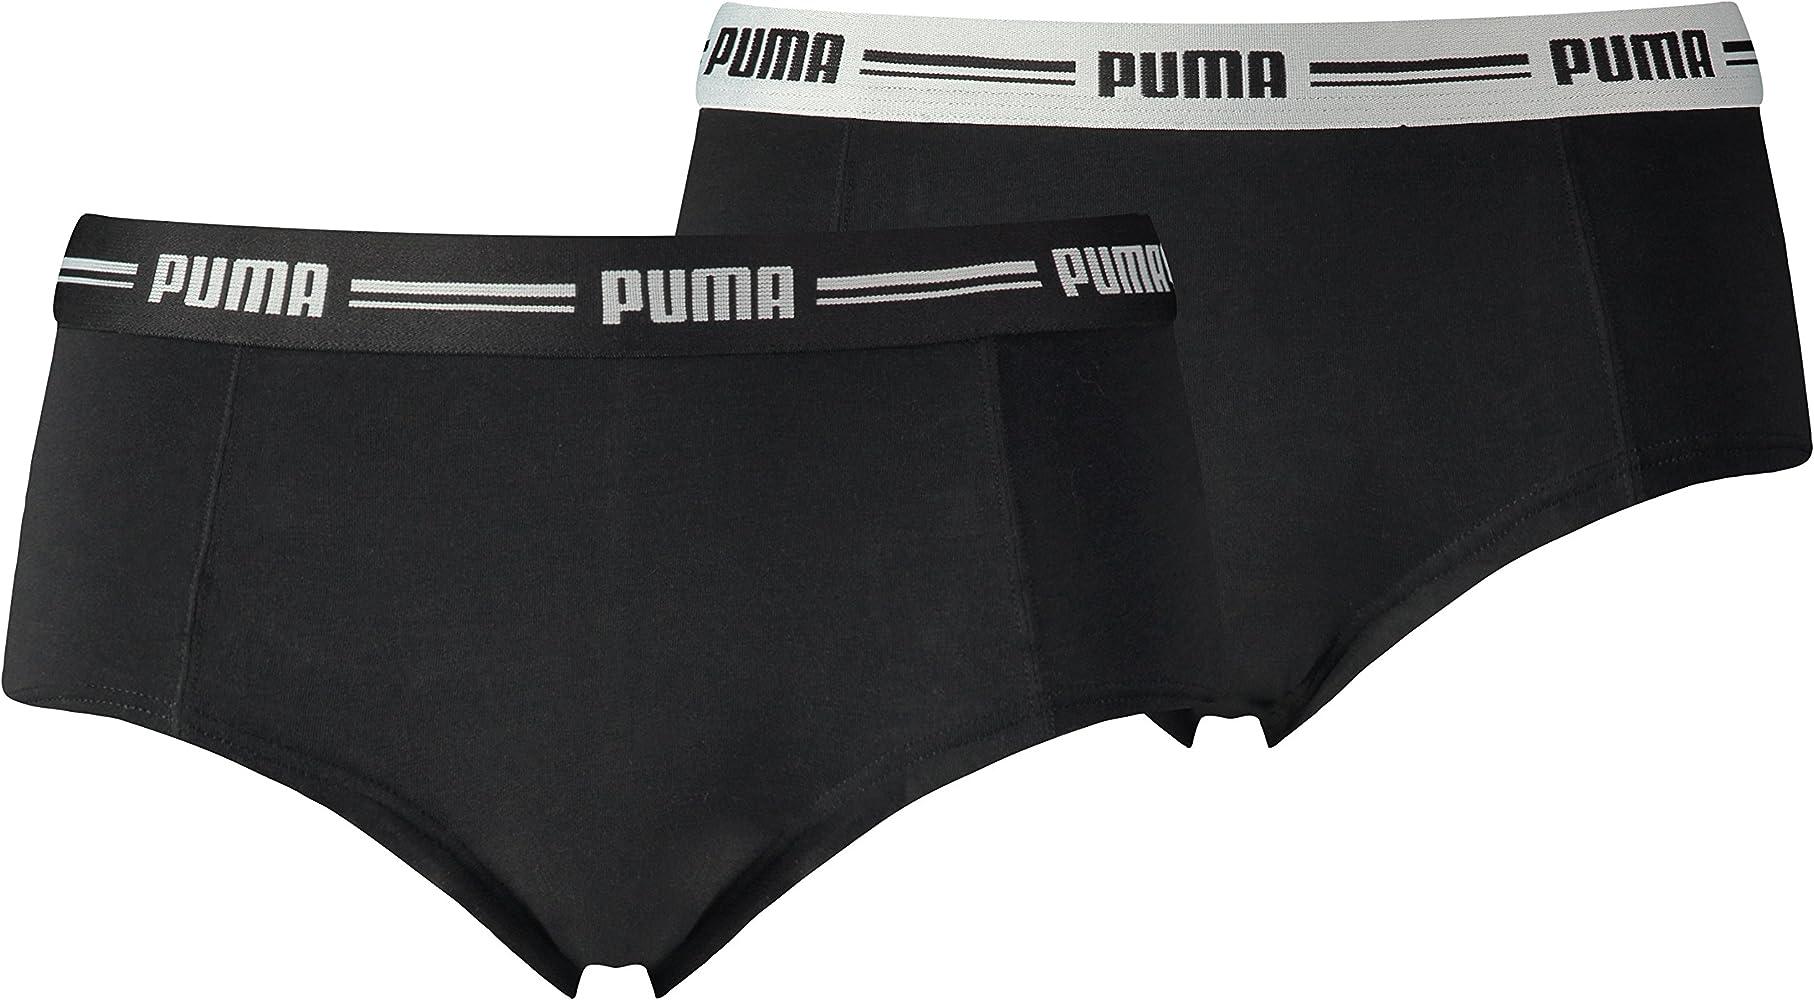 Puma 5730100010, Bóxer Para Mujer, Negro (Black), XS, Pack de 2 ...